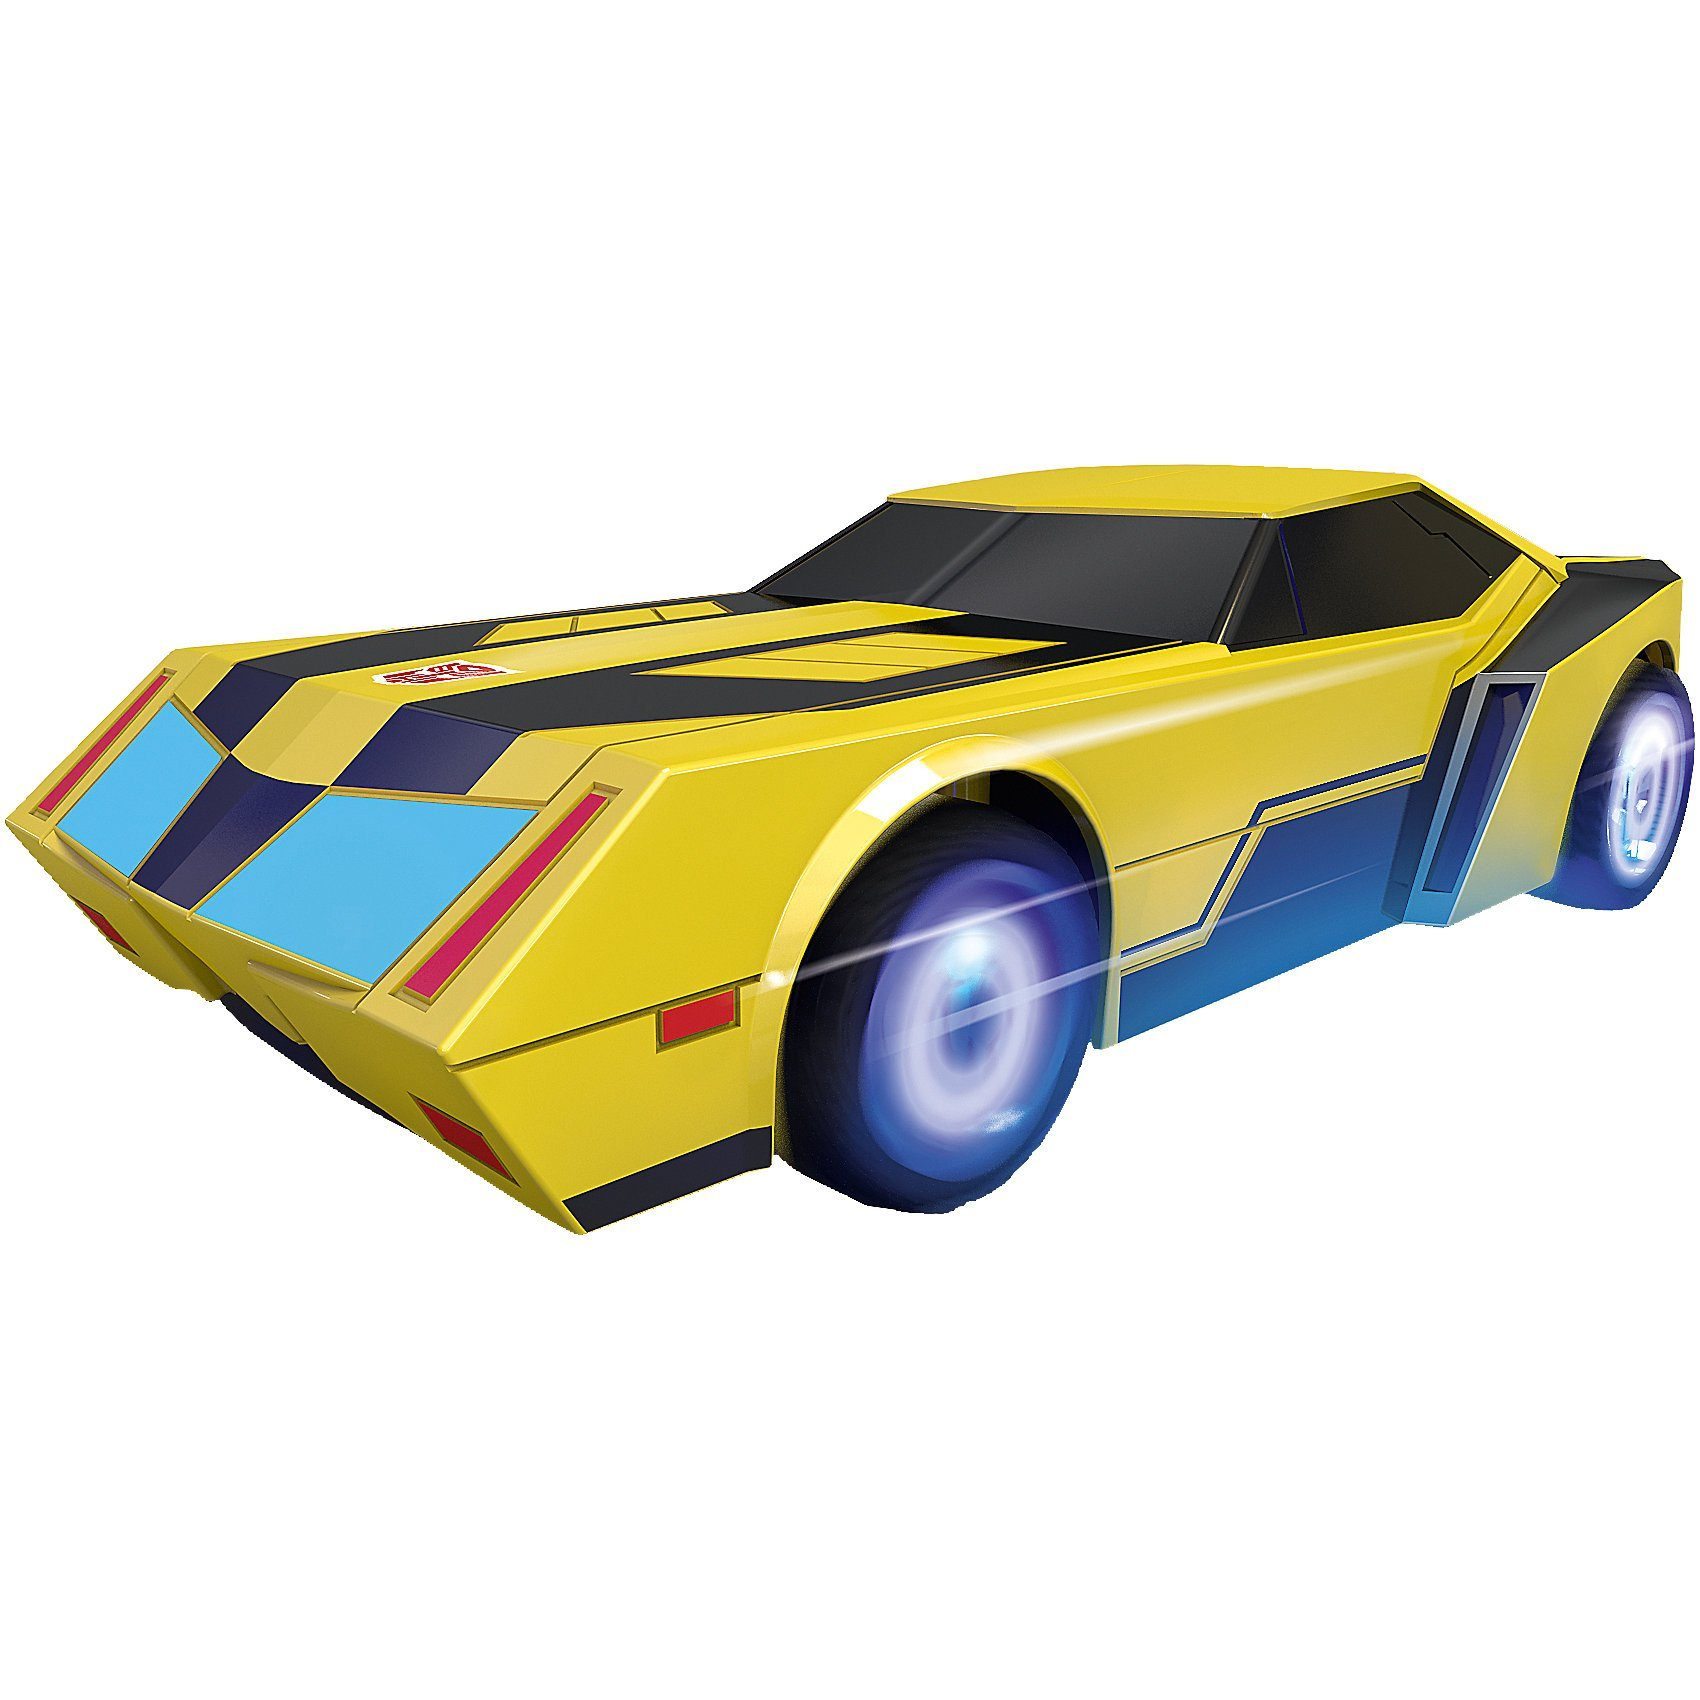 Dickie Toys Transformers RC Fahrzeug Turbo Racer Bumblebee